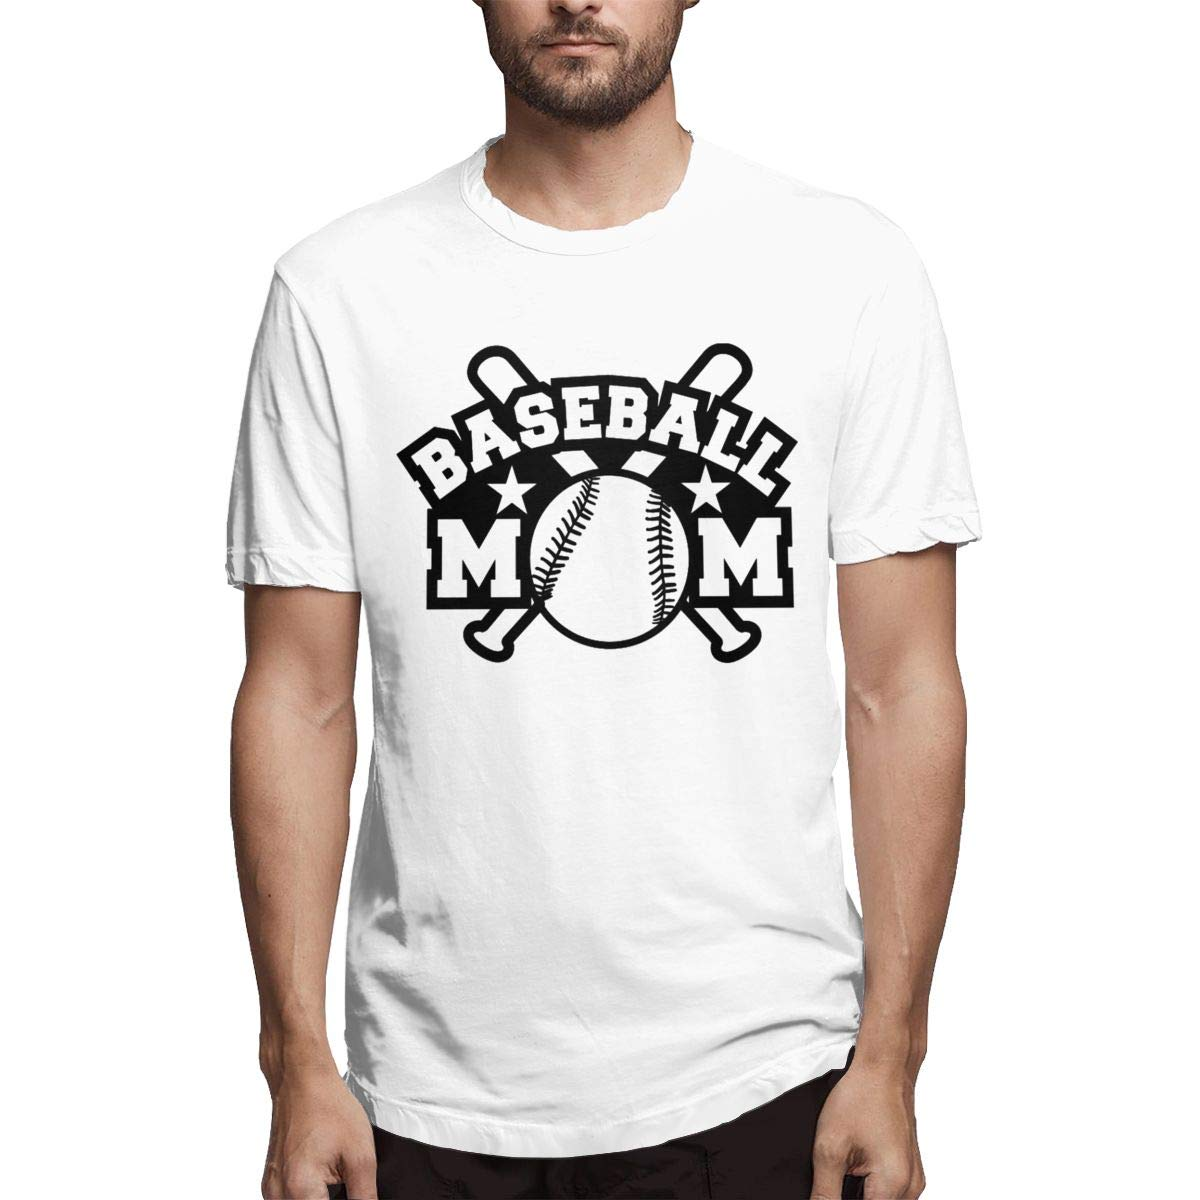 Holygery Men Baseball Mom Ultra Soft Crew-Neck Coton Short Sleeves Tops